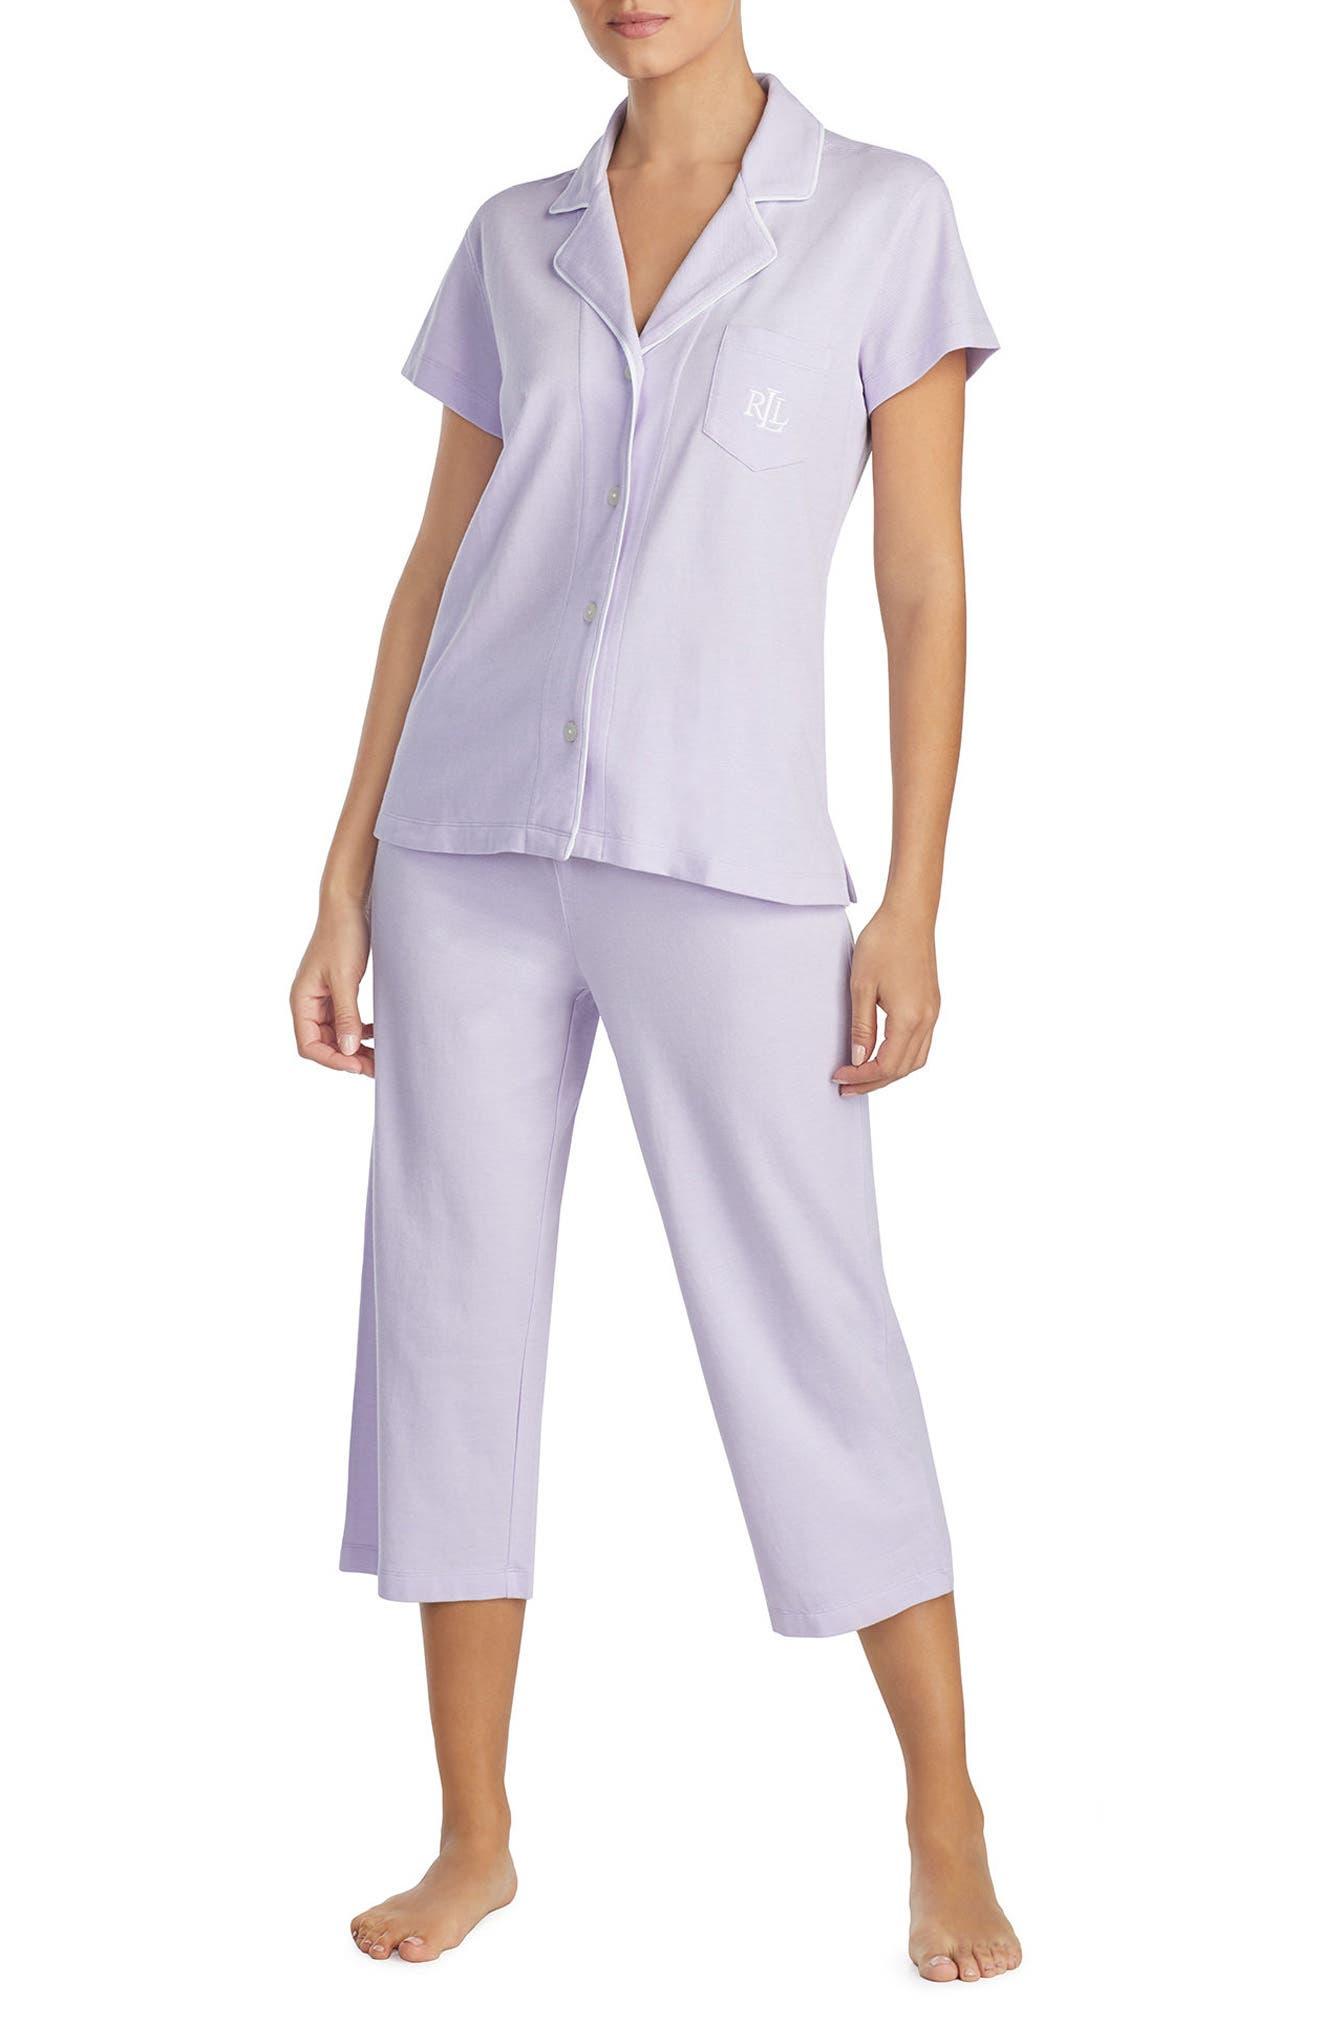 Knit Capri Pajamas,                             Main thumbnail 1, color,                             530